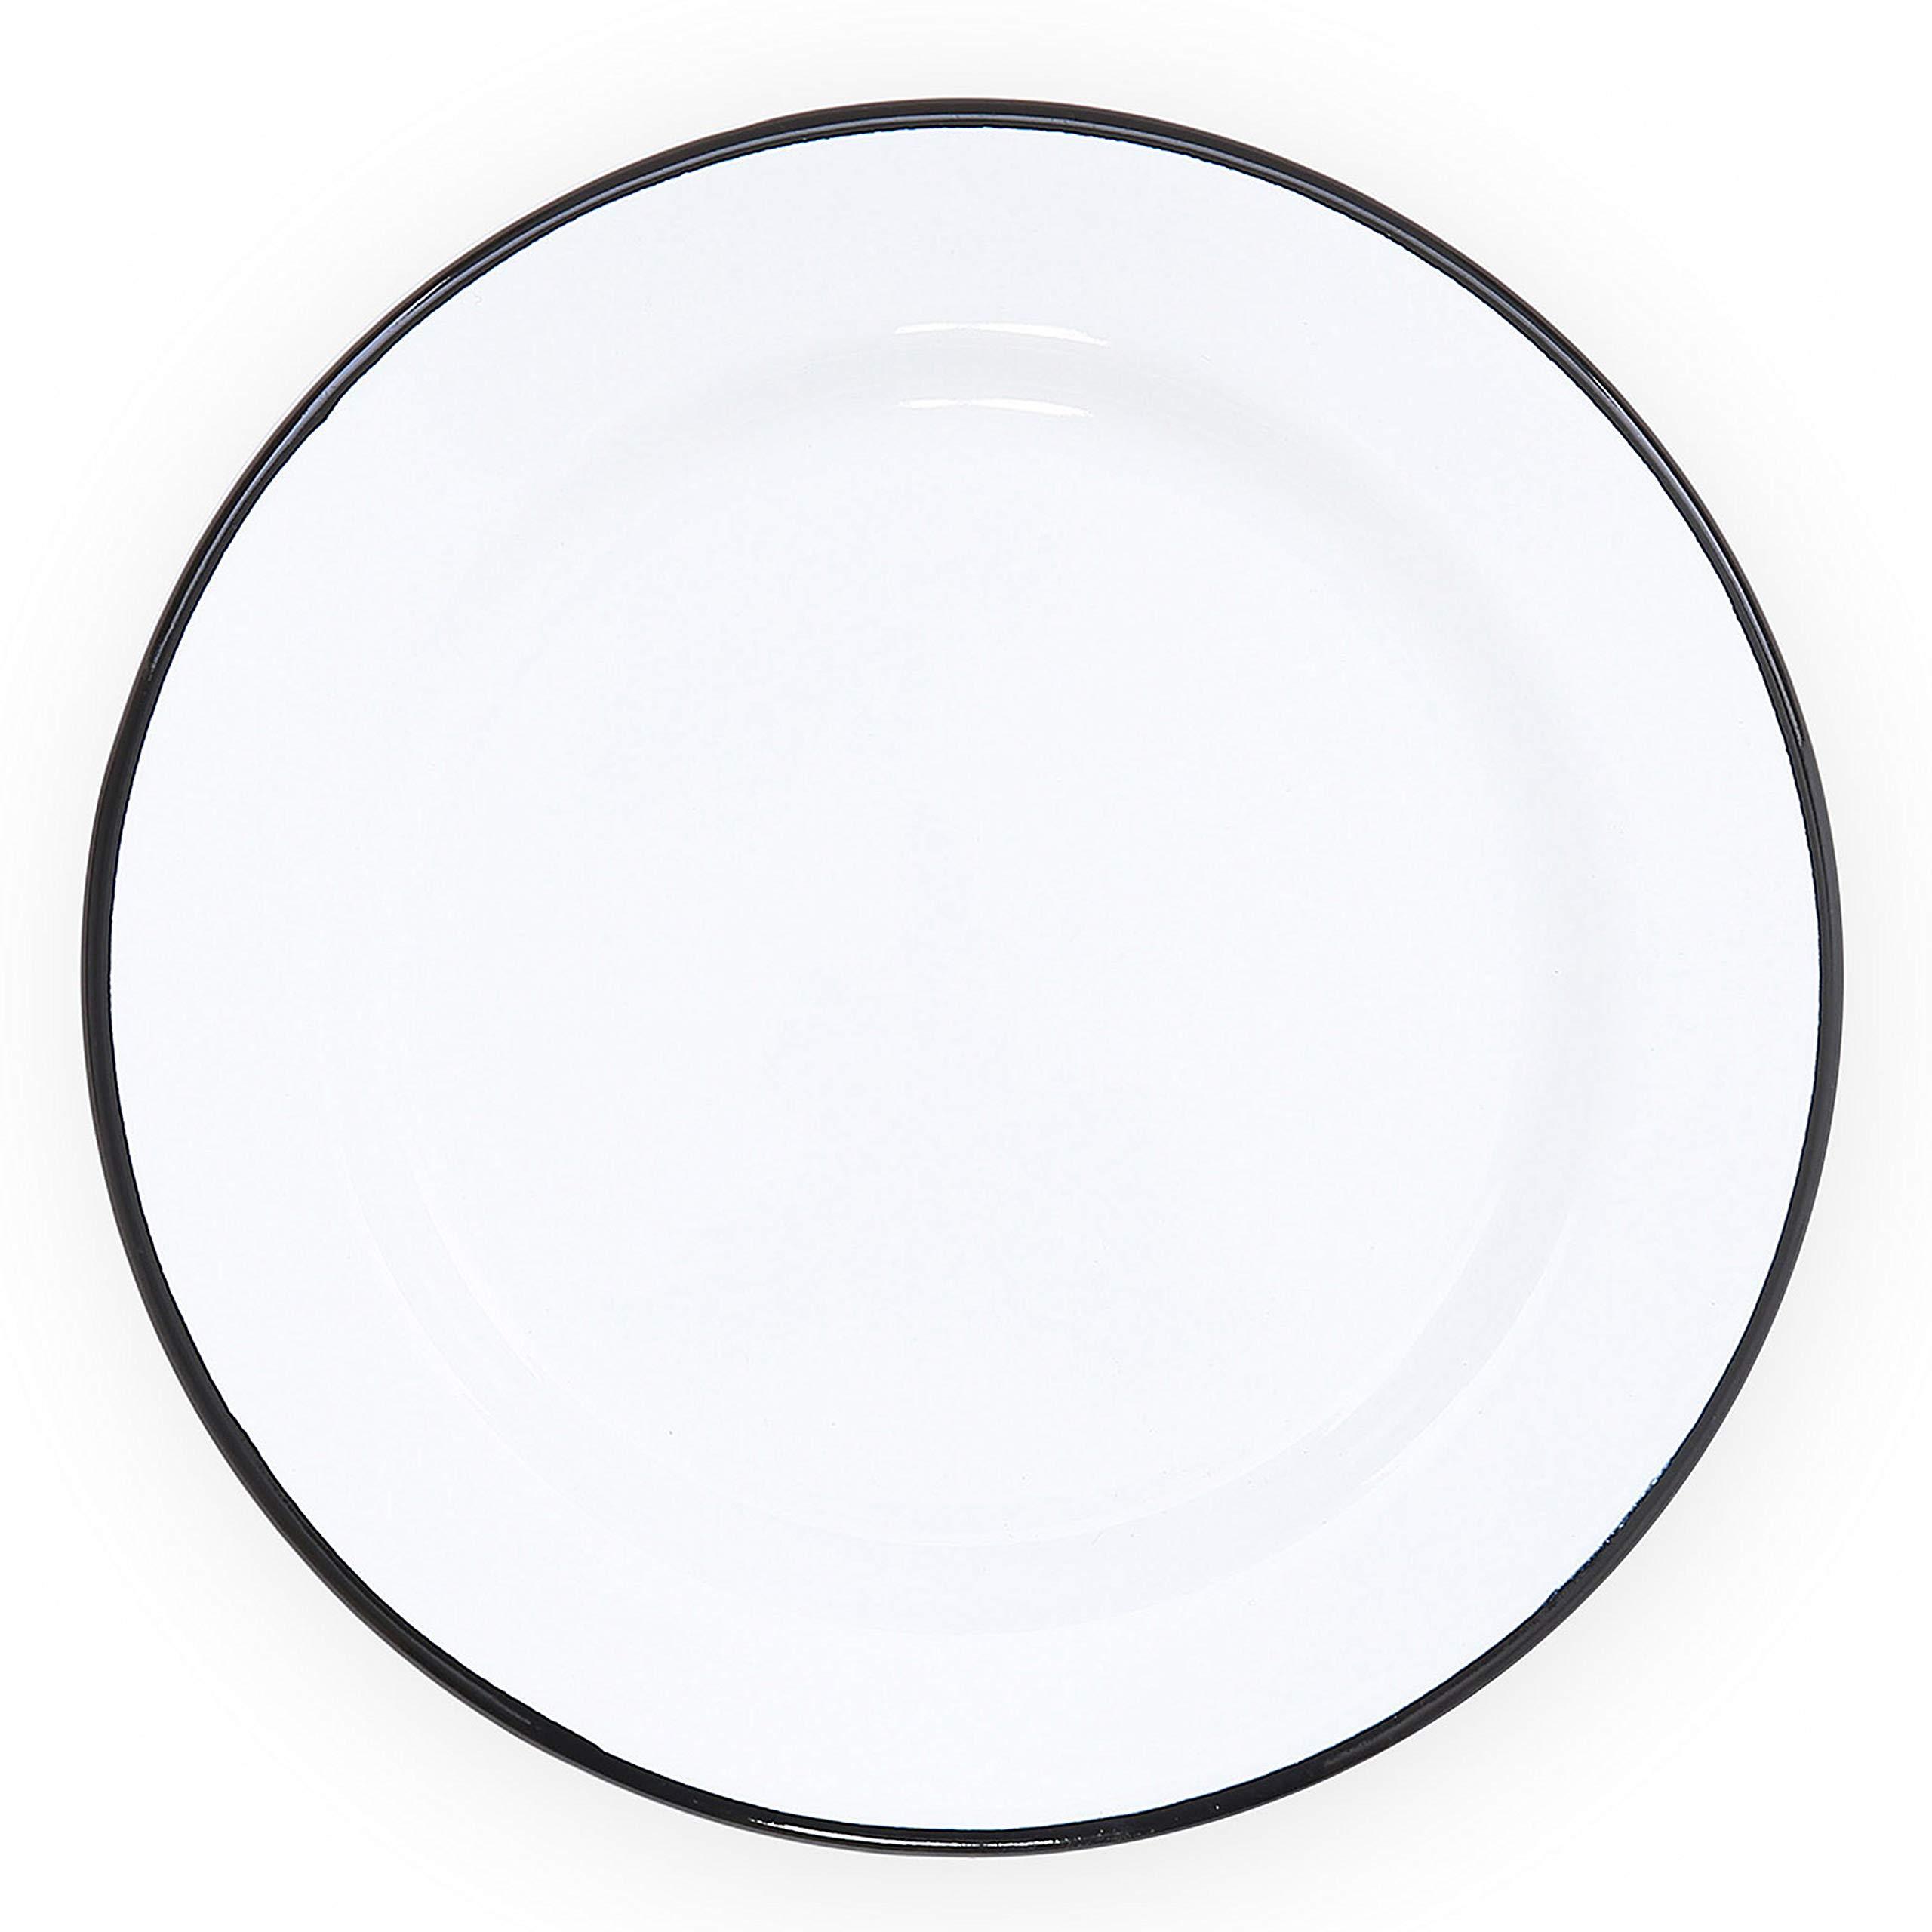 Enamelware Flat Salad Plate, 8 inch, Vintage White/Black (Set of 4)